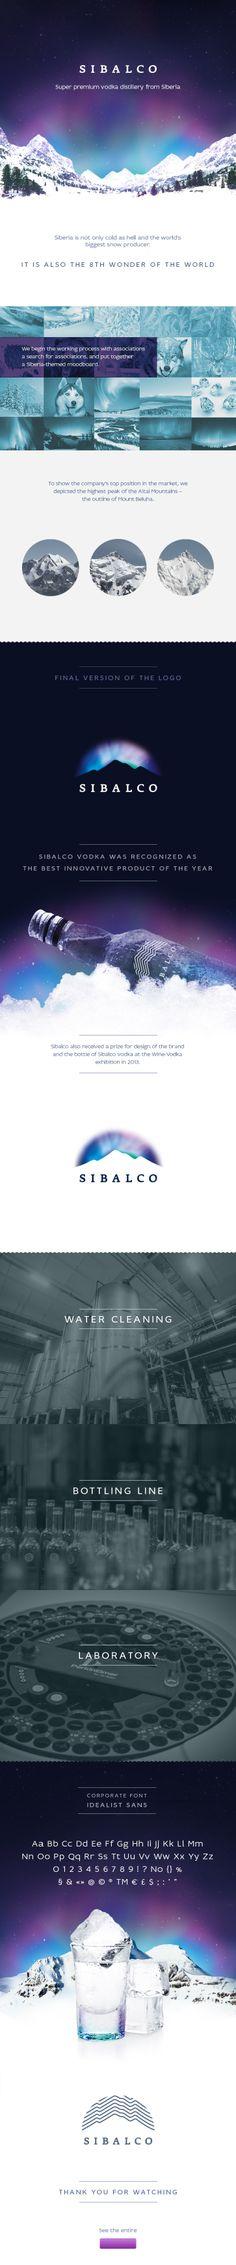 Sibalco identity http://www.scada.lv/portfolio/sibalco/id/